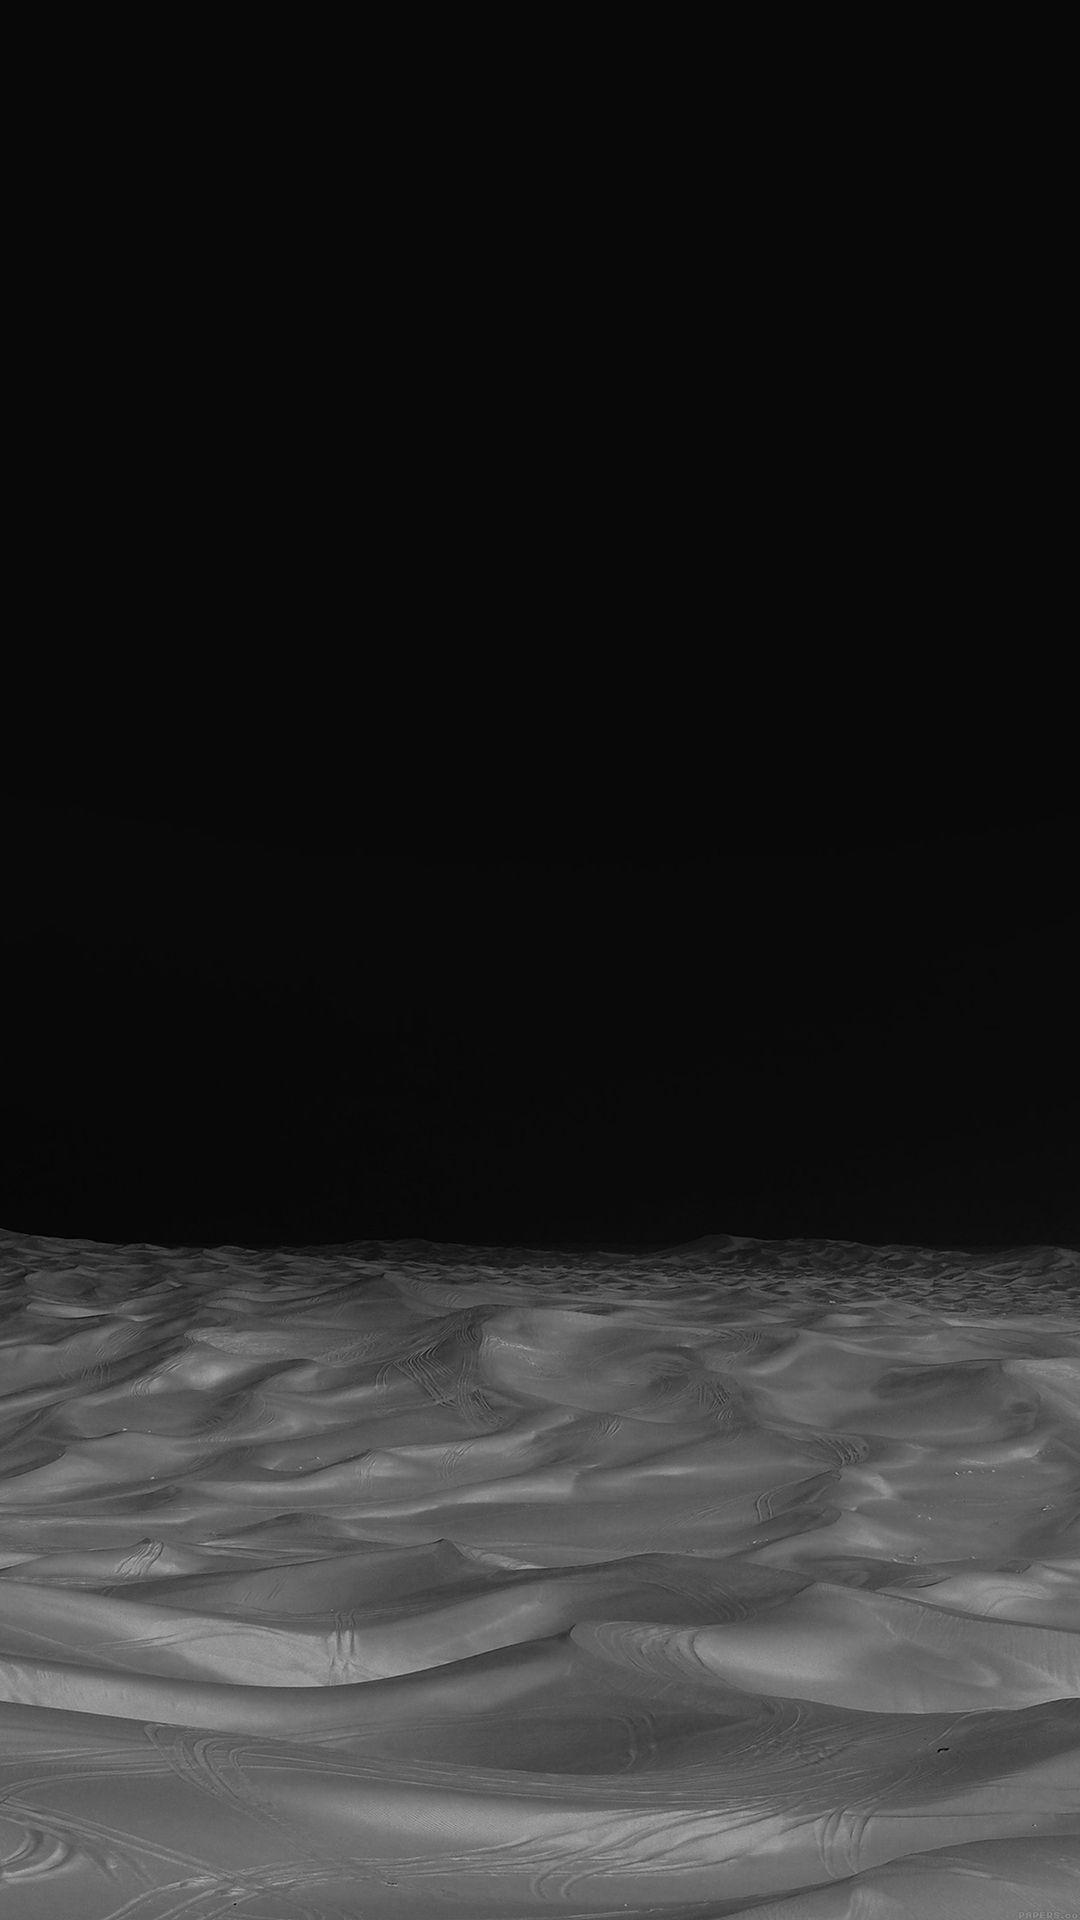 Desert Minimal Dark Black Nature Sky Earth Iphone 6 Wallpaper Download Iphone Wallpapers Ipad Wallpapers One Stop Dark Wallpaper Dark Black Iphone Pictures